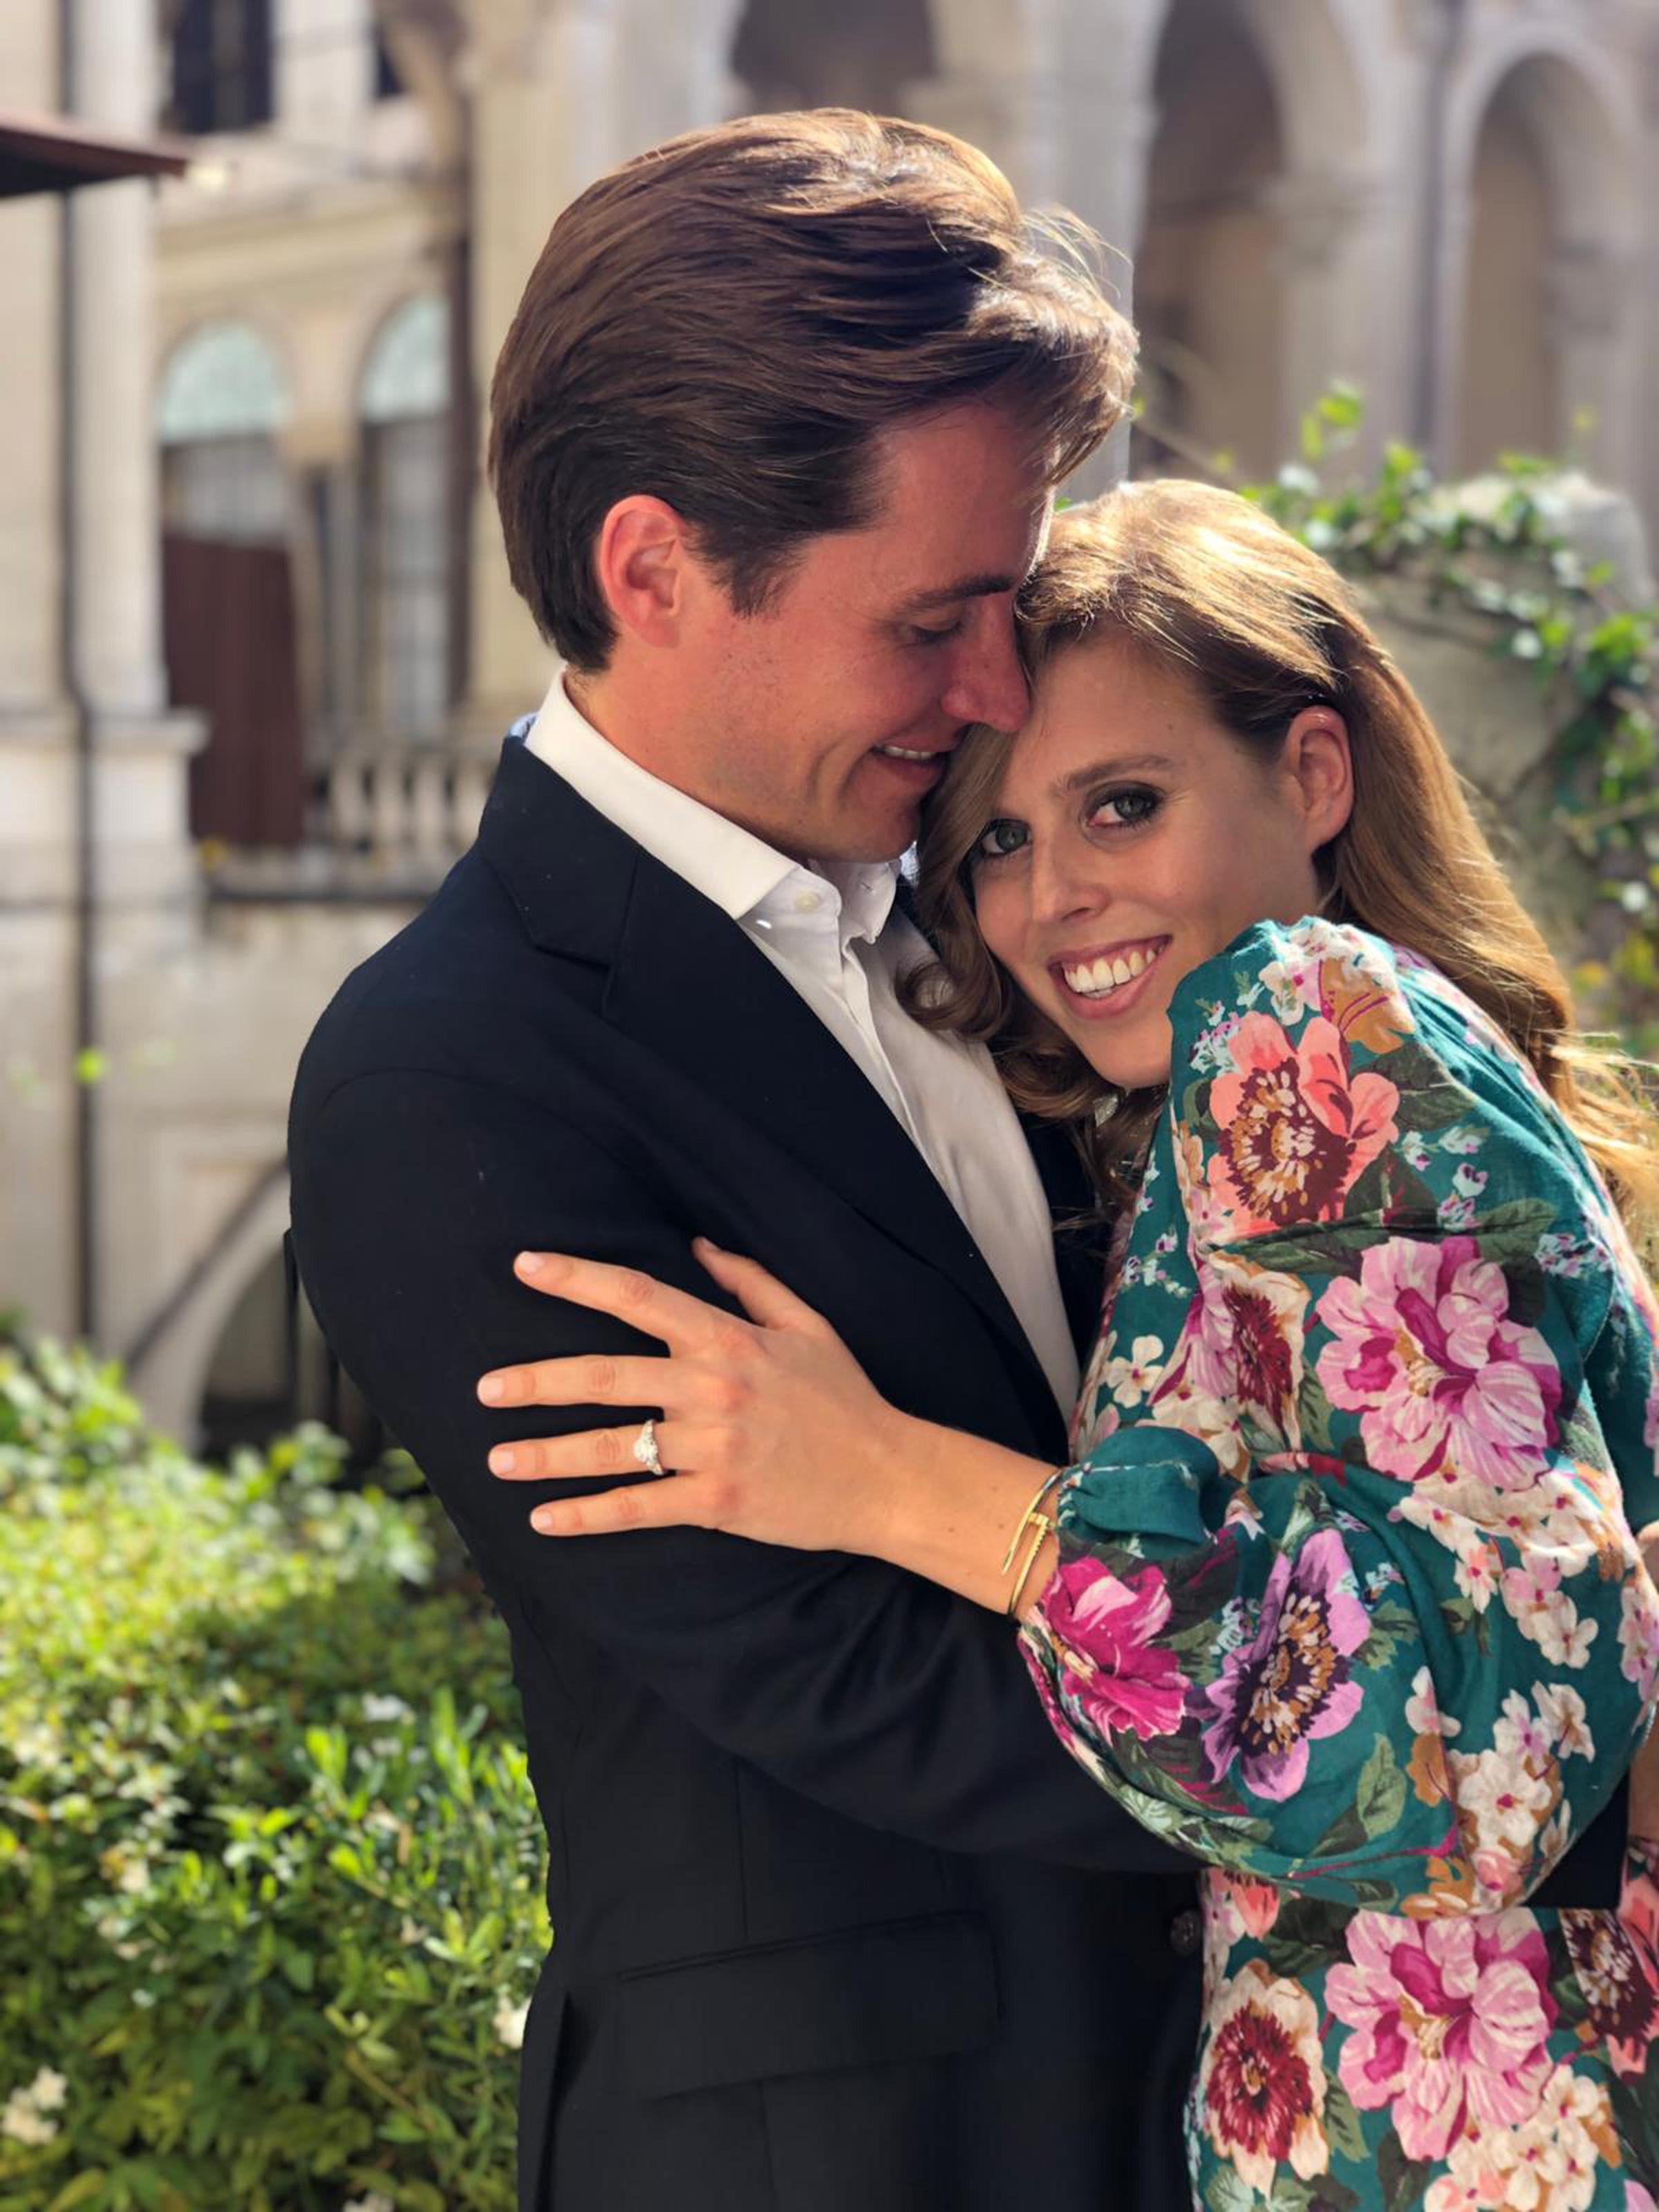 Princess Beatrice and Mr Edoardo Mapelli Mozzi announce their engagement. [Photo: PA]